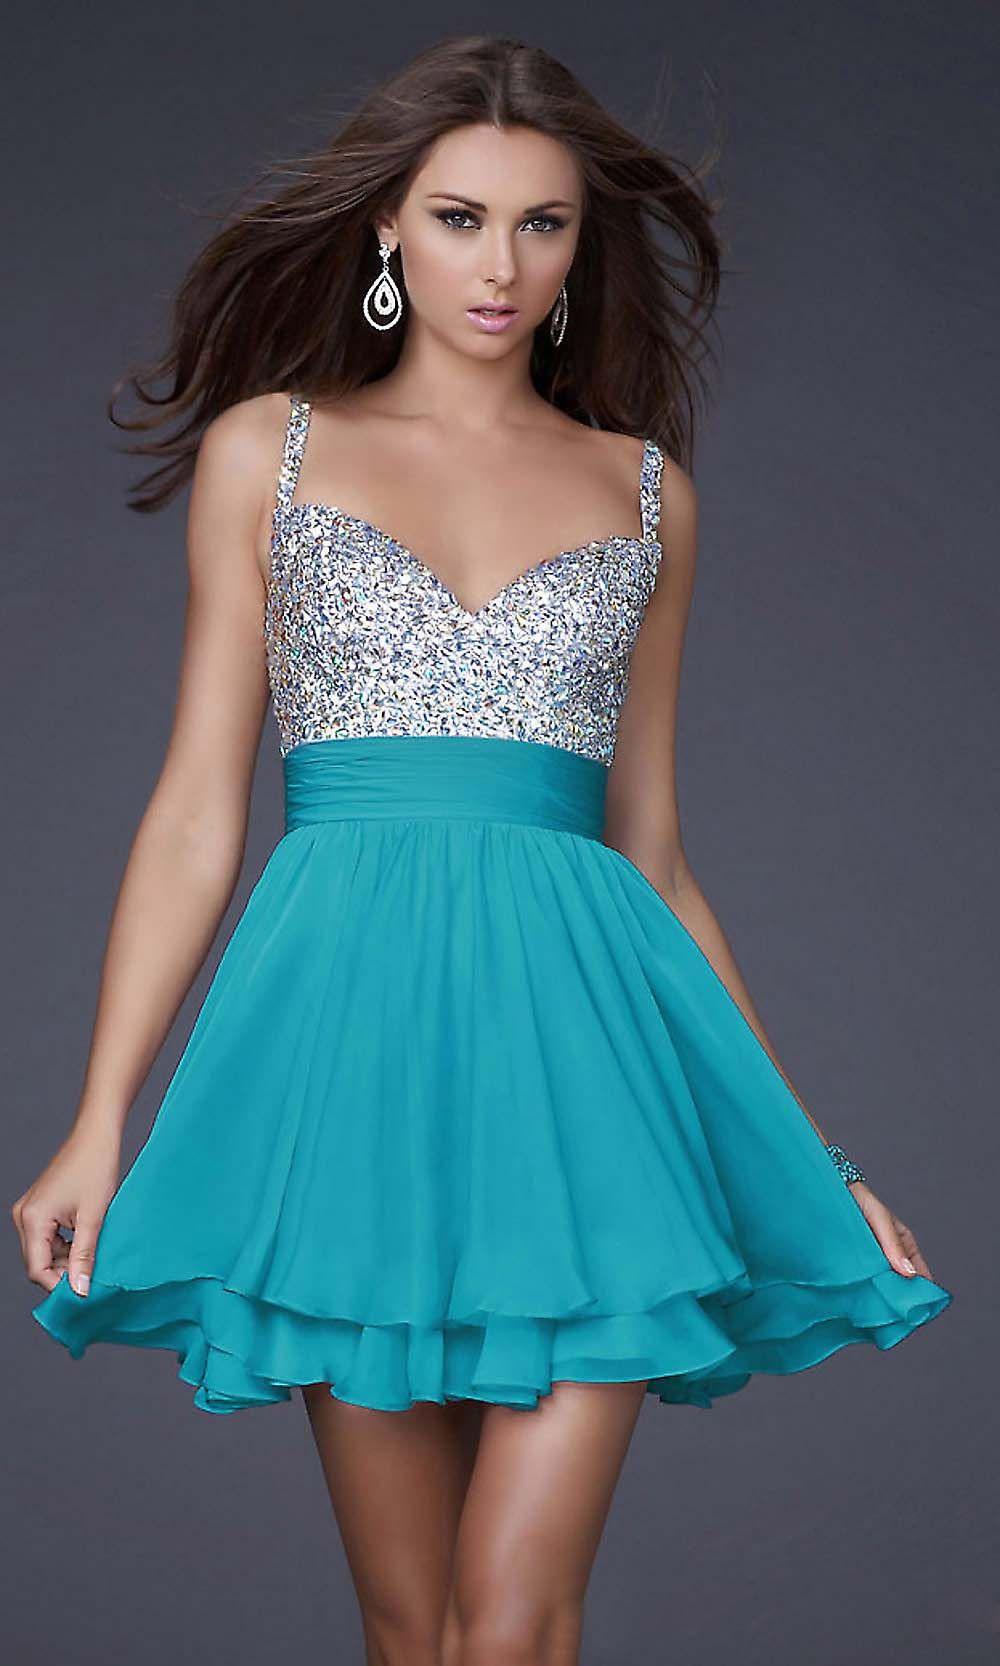 Juniors Short Prom Dresses - Ocodea.com